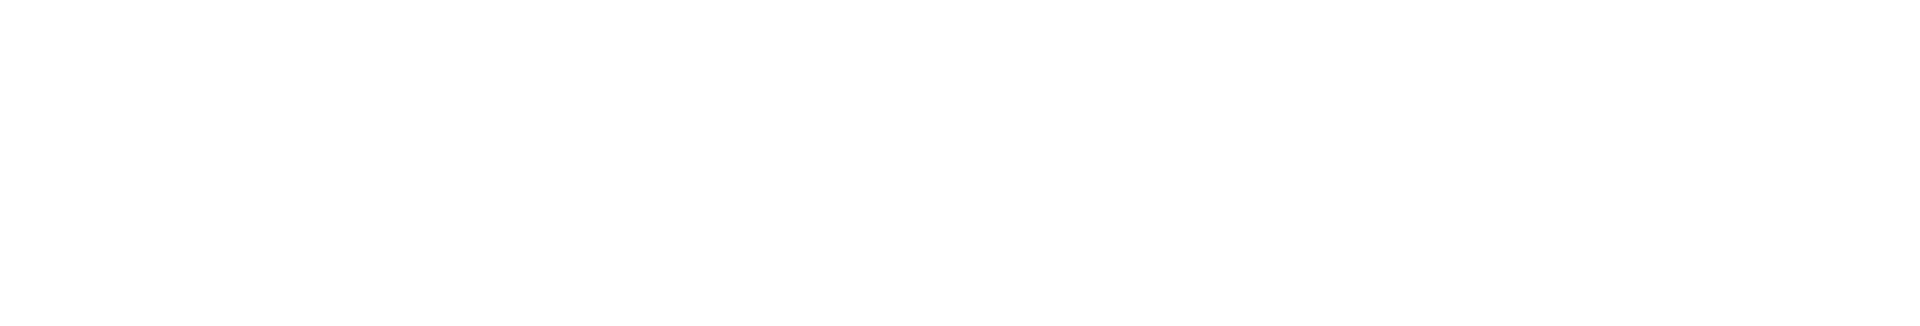 Background Logo Text